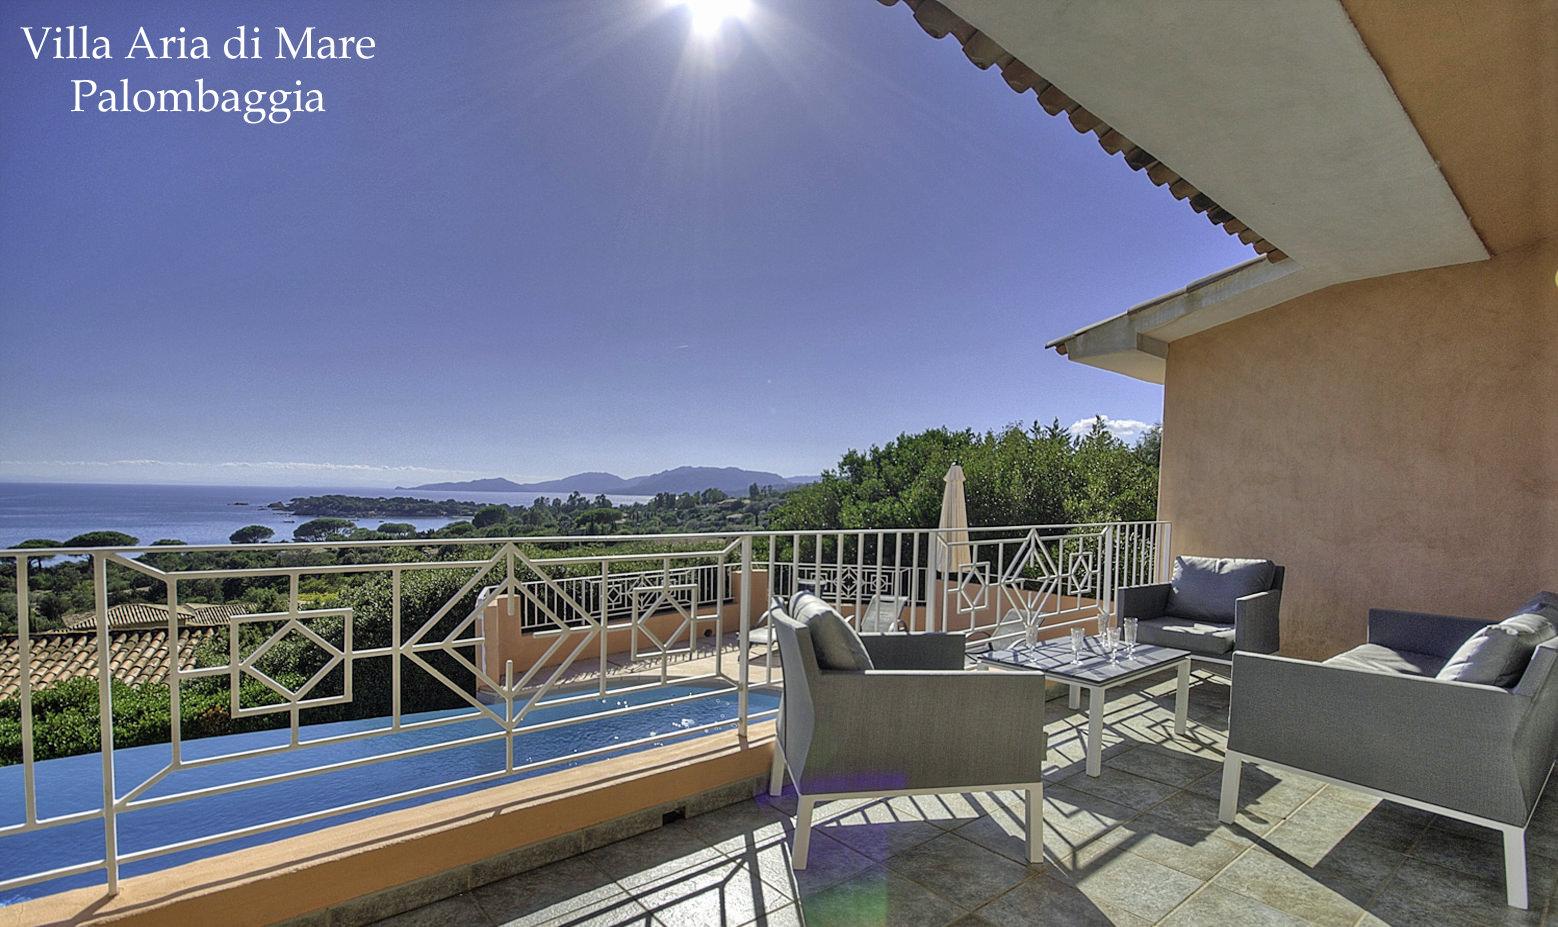 Villa bord de mer à Palombaggia